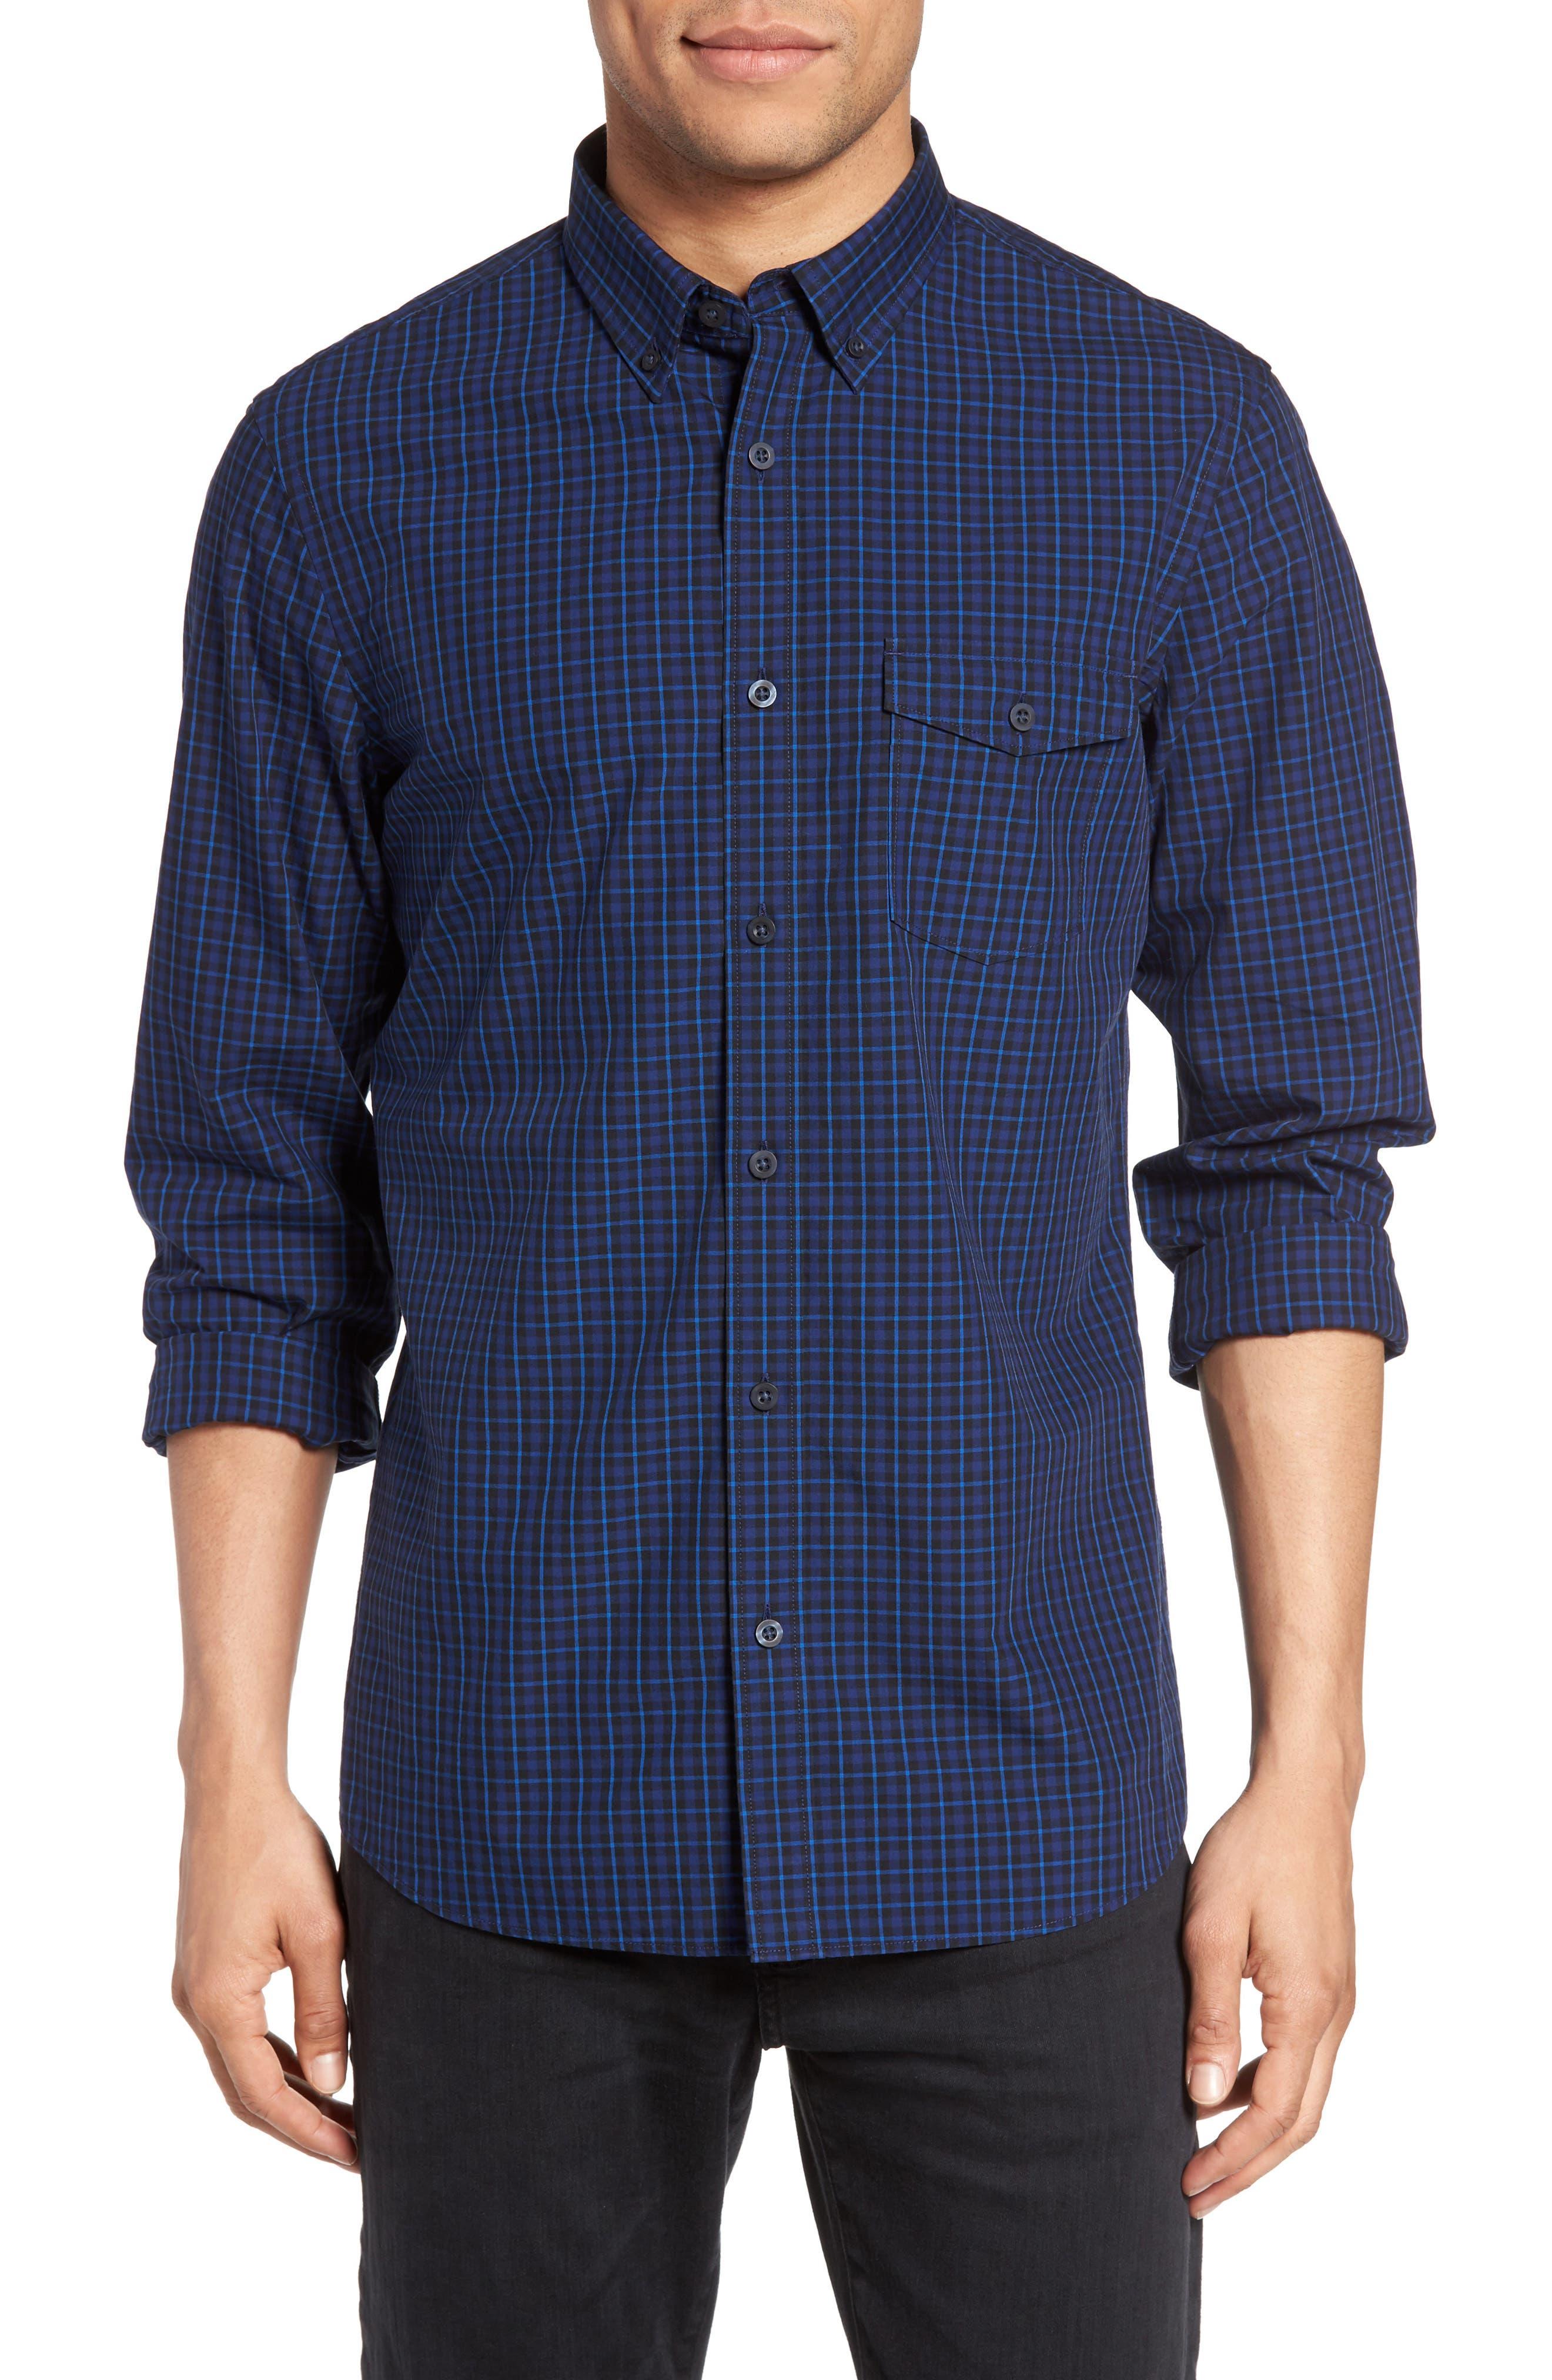 Alternate Image 1 Selected - Nordstrom Men's Shop Slim Fit Plaid Sport Shirt (Regular & Tall)